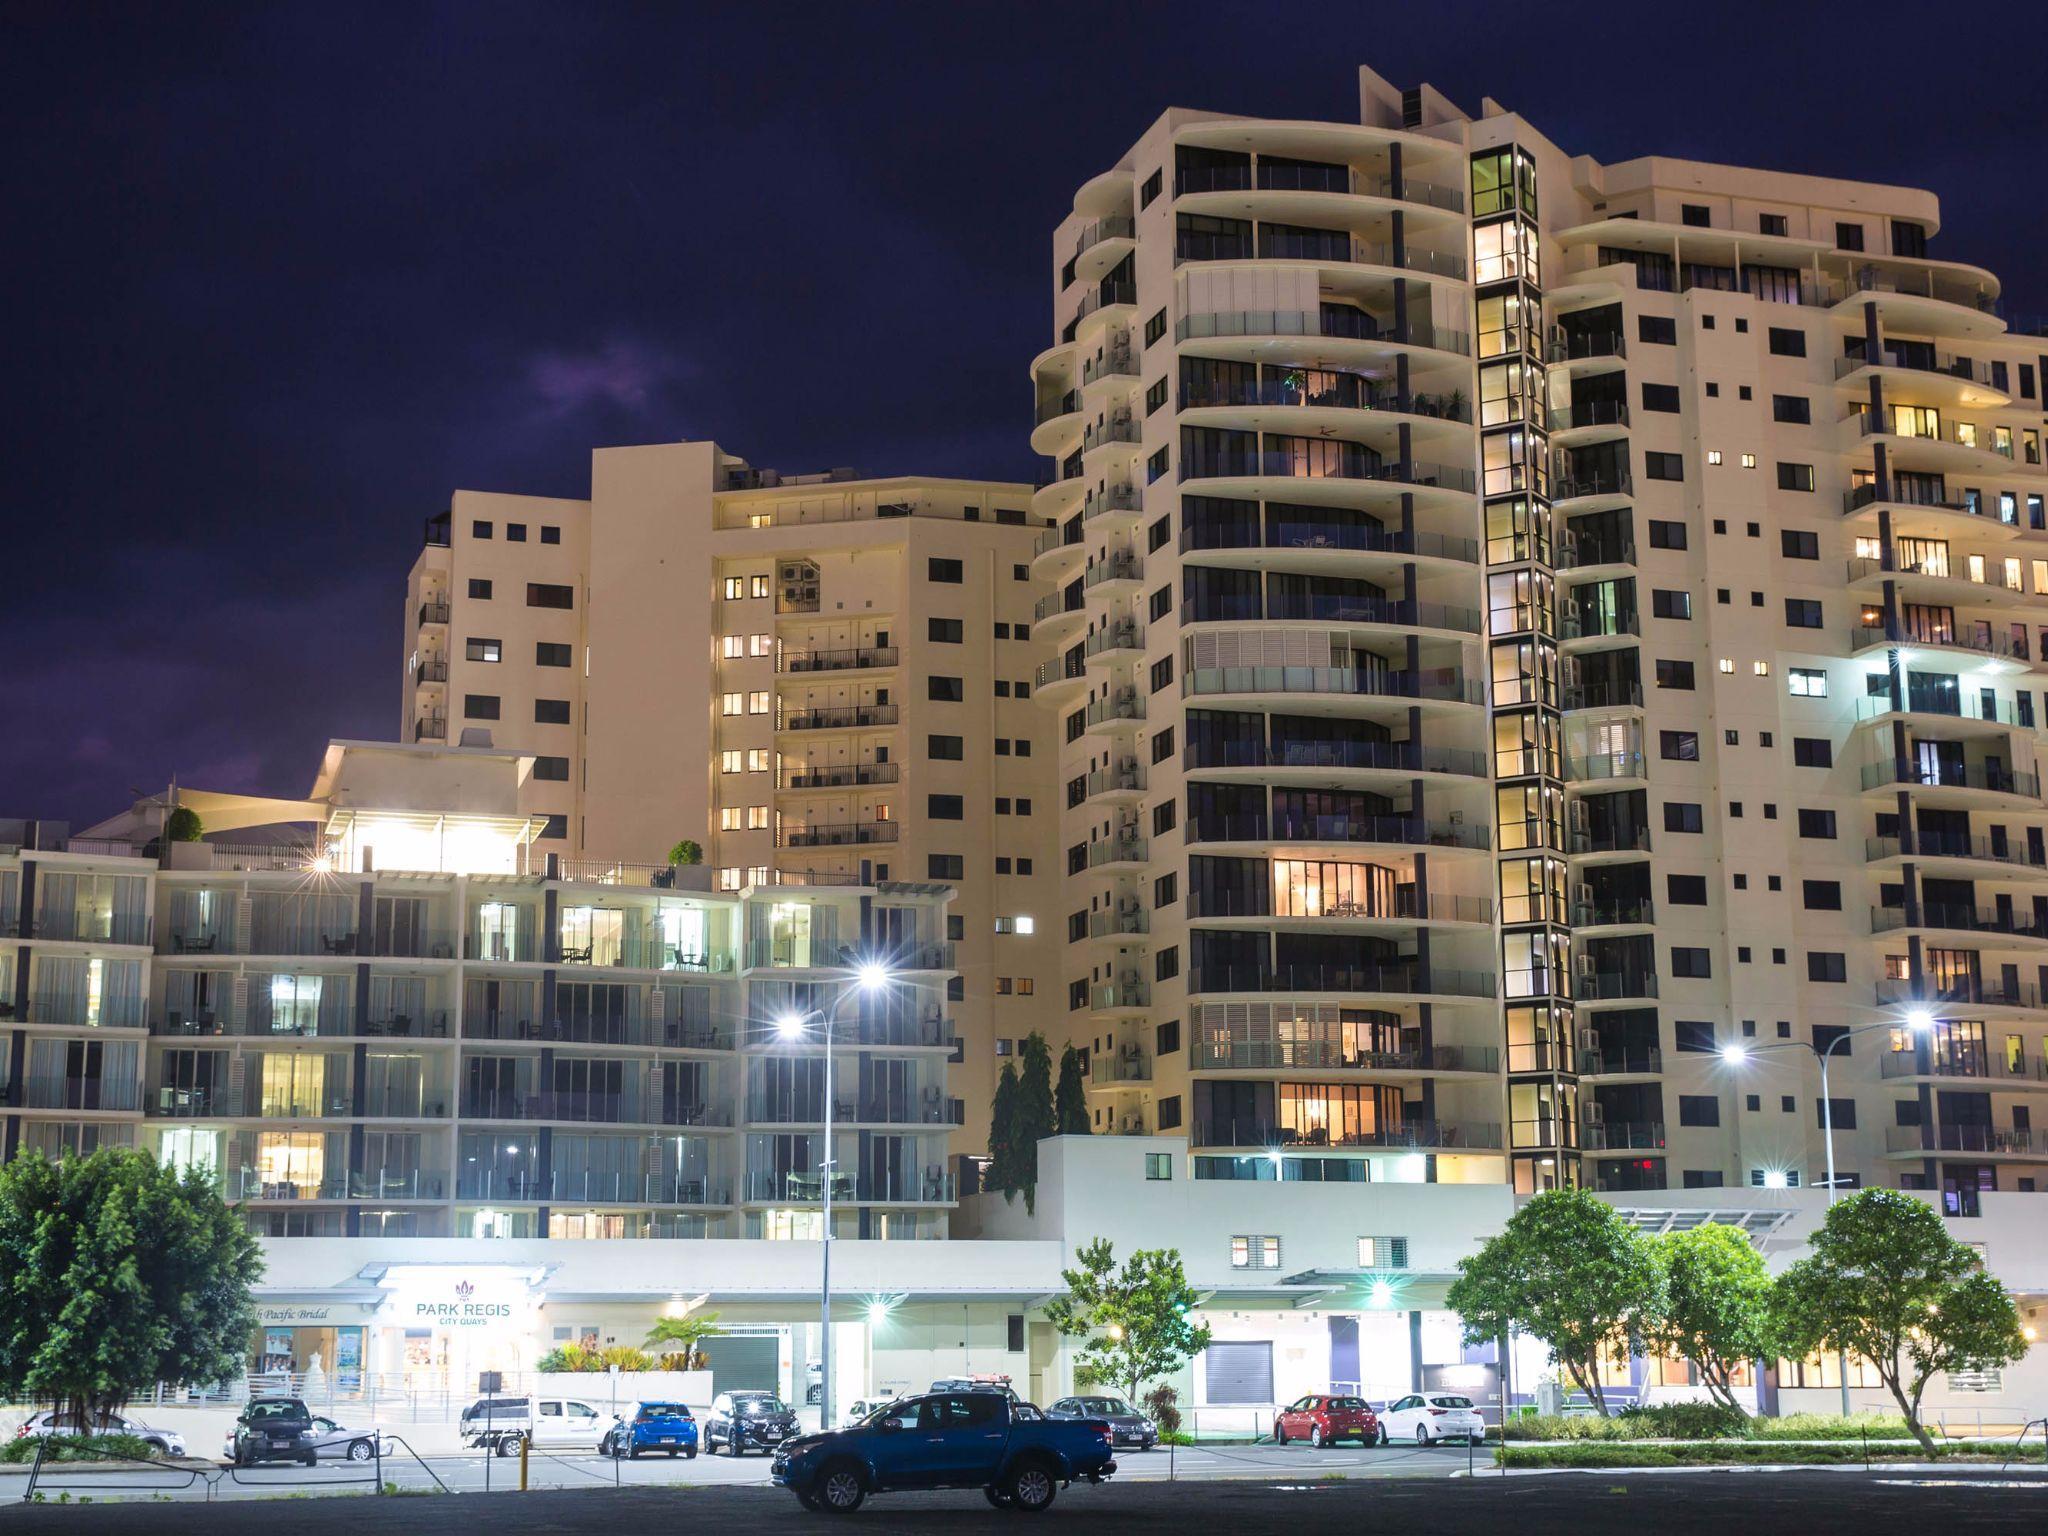 Park Regis City Quays Hotel – Reviews, Pictures, Price and Deals